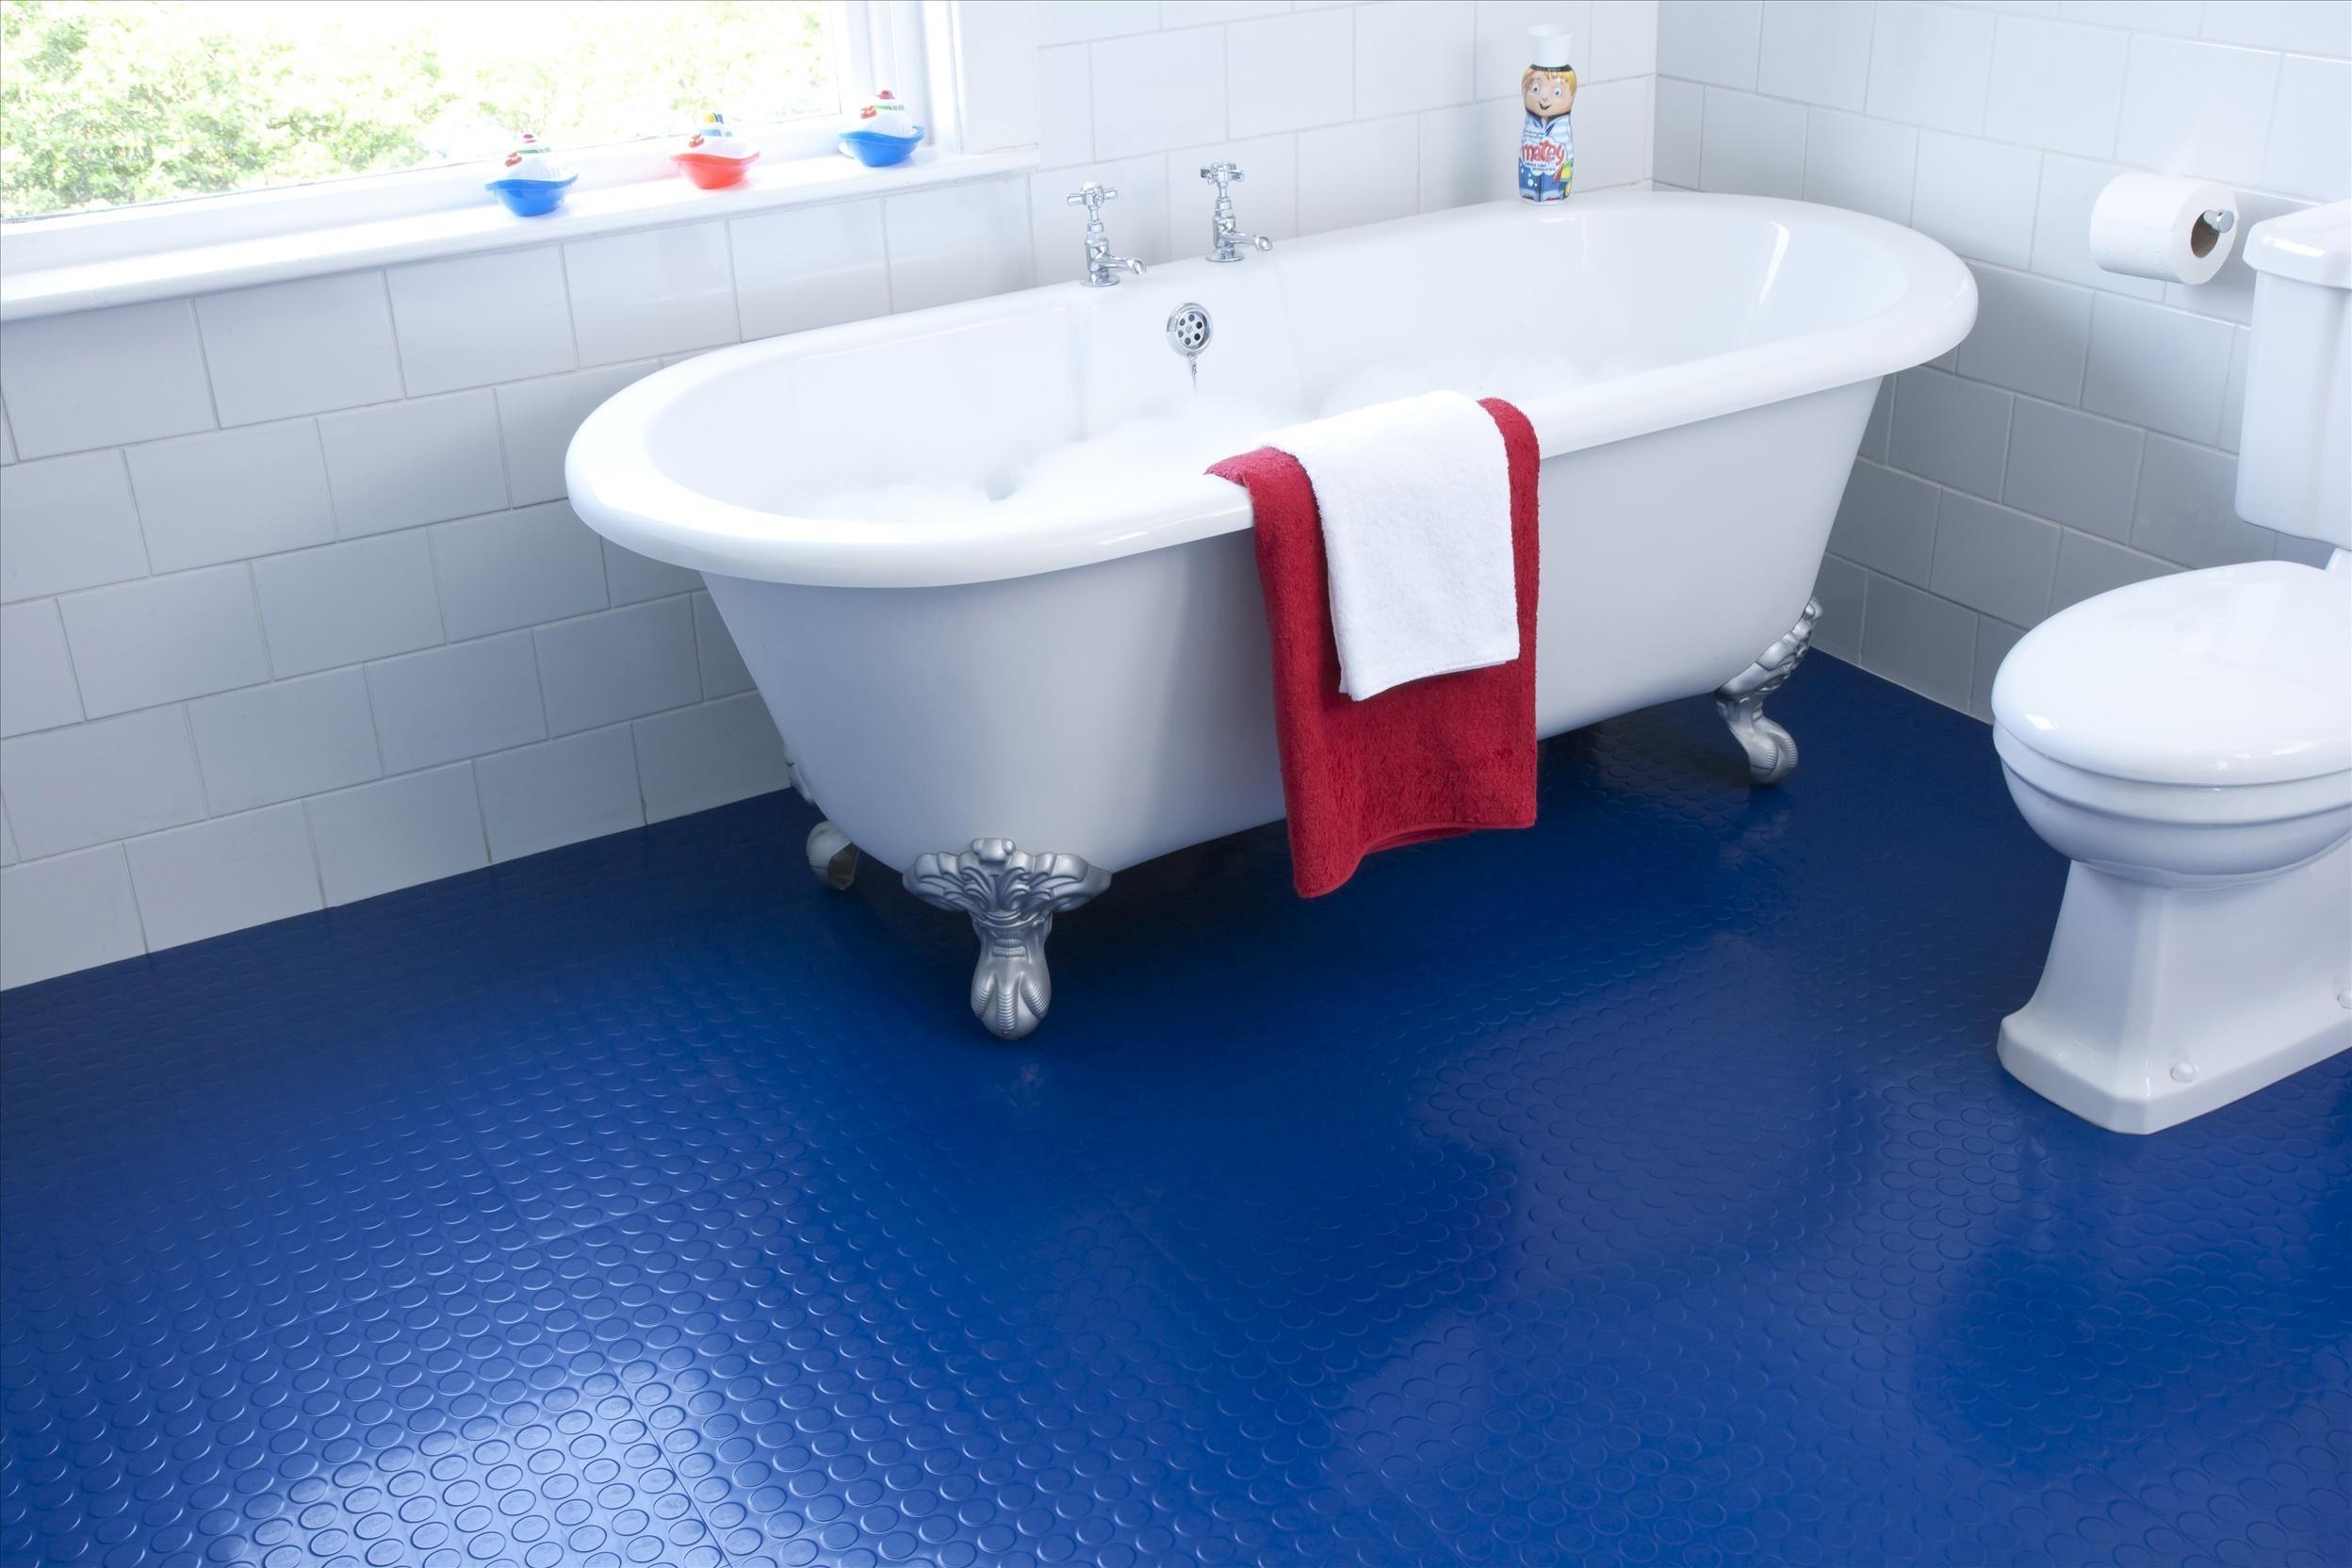 Waterproof Bathroom Walllpaper: Stylish Waterproof Bathroom Flooring Décor